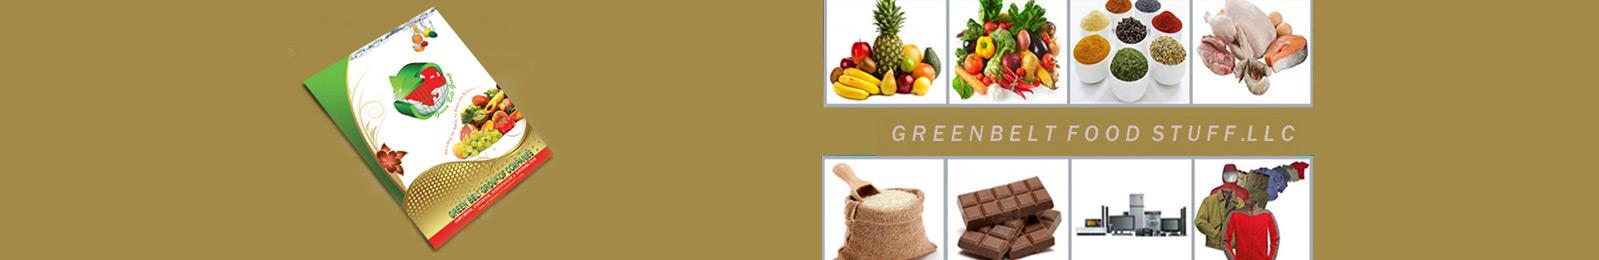 Vegetable importers / exporters Dubai, UAE, Green Belt Group of